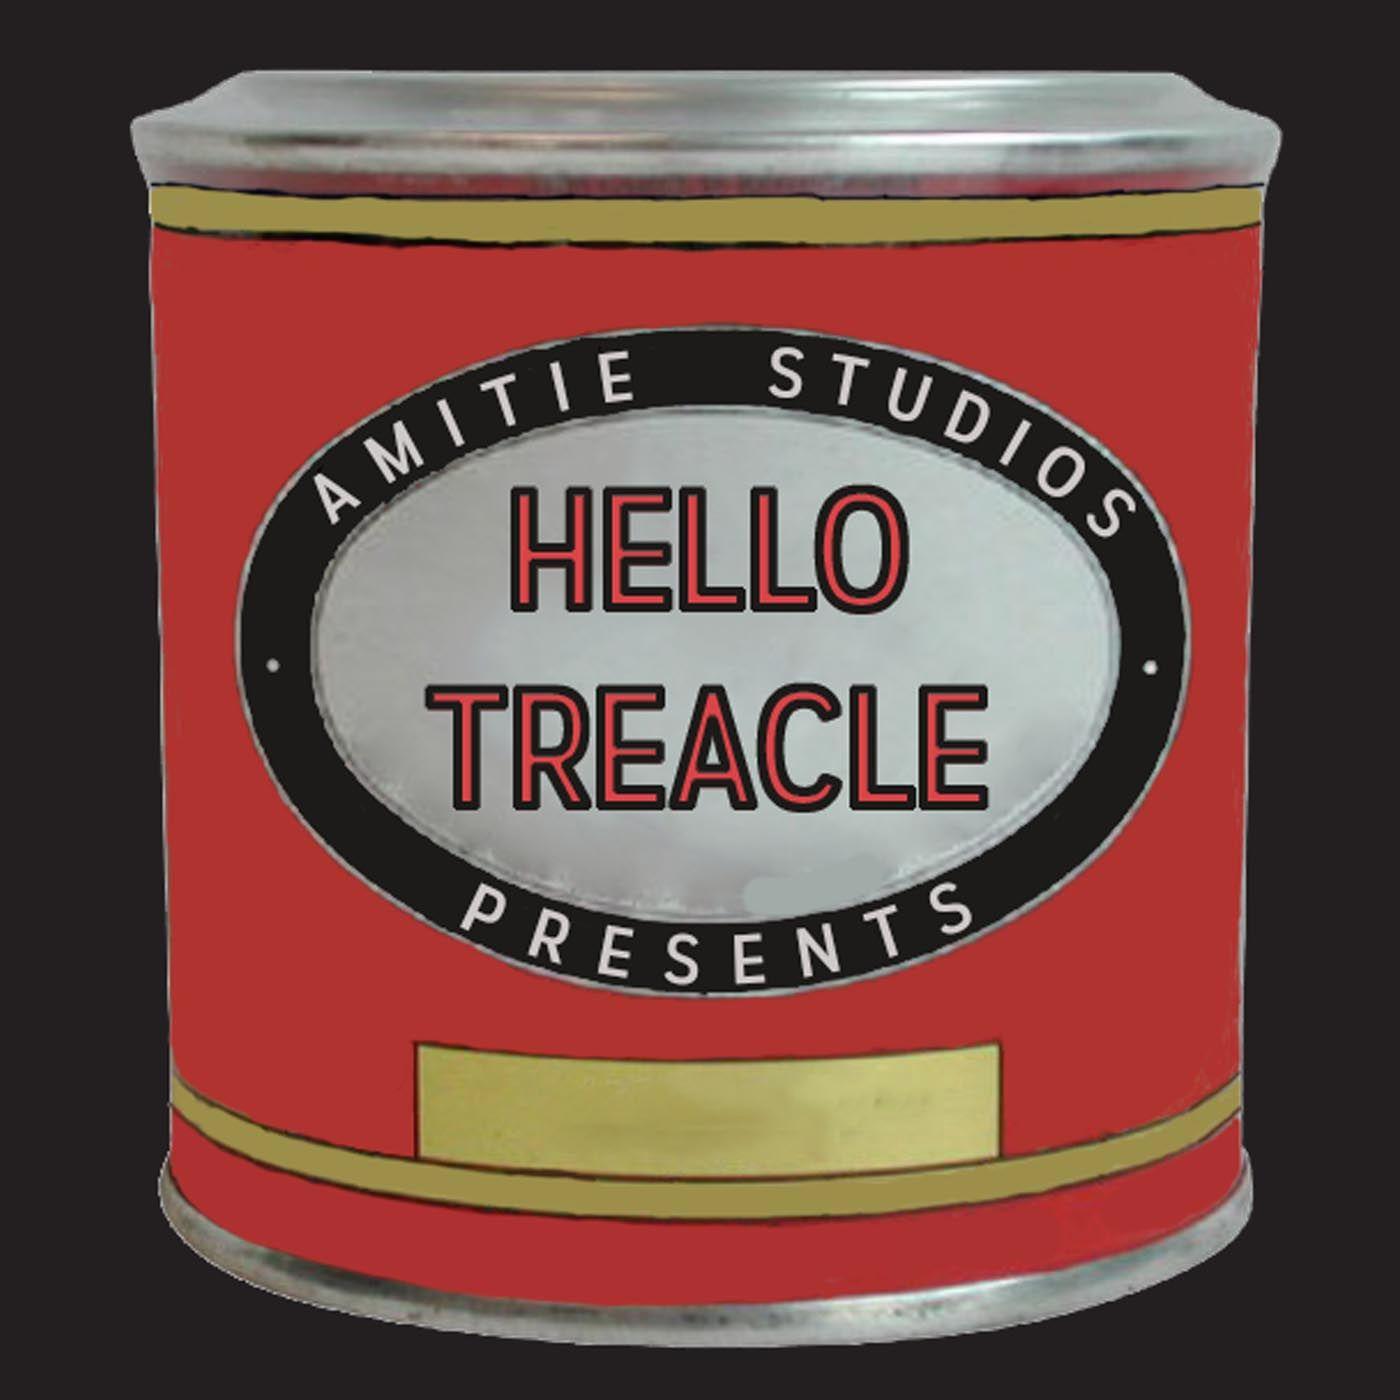 Hello Treacle